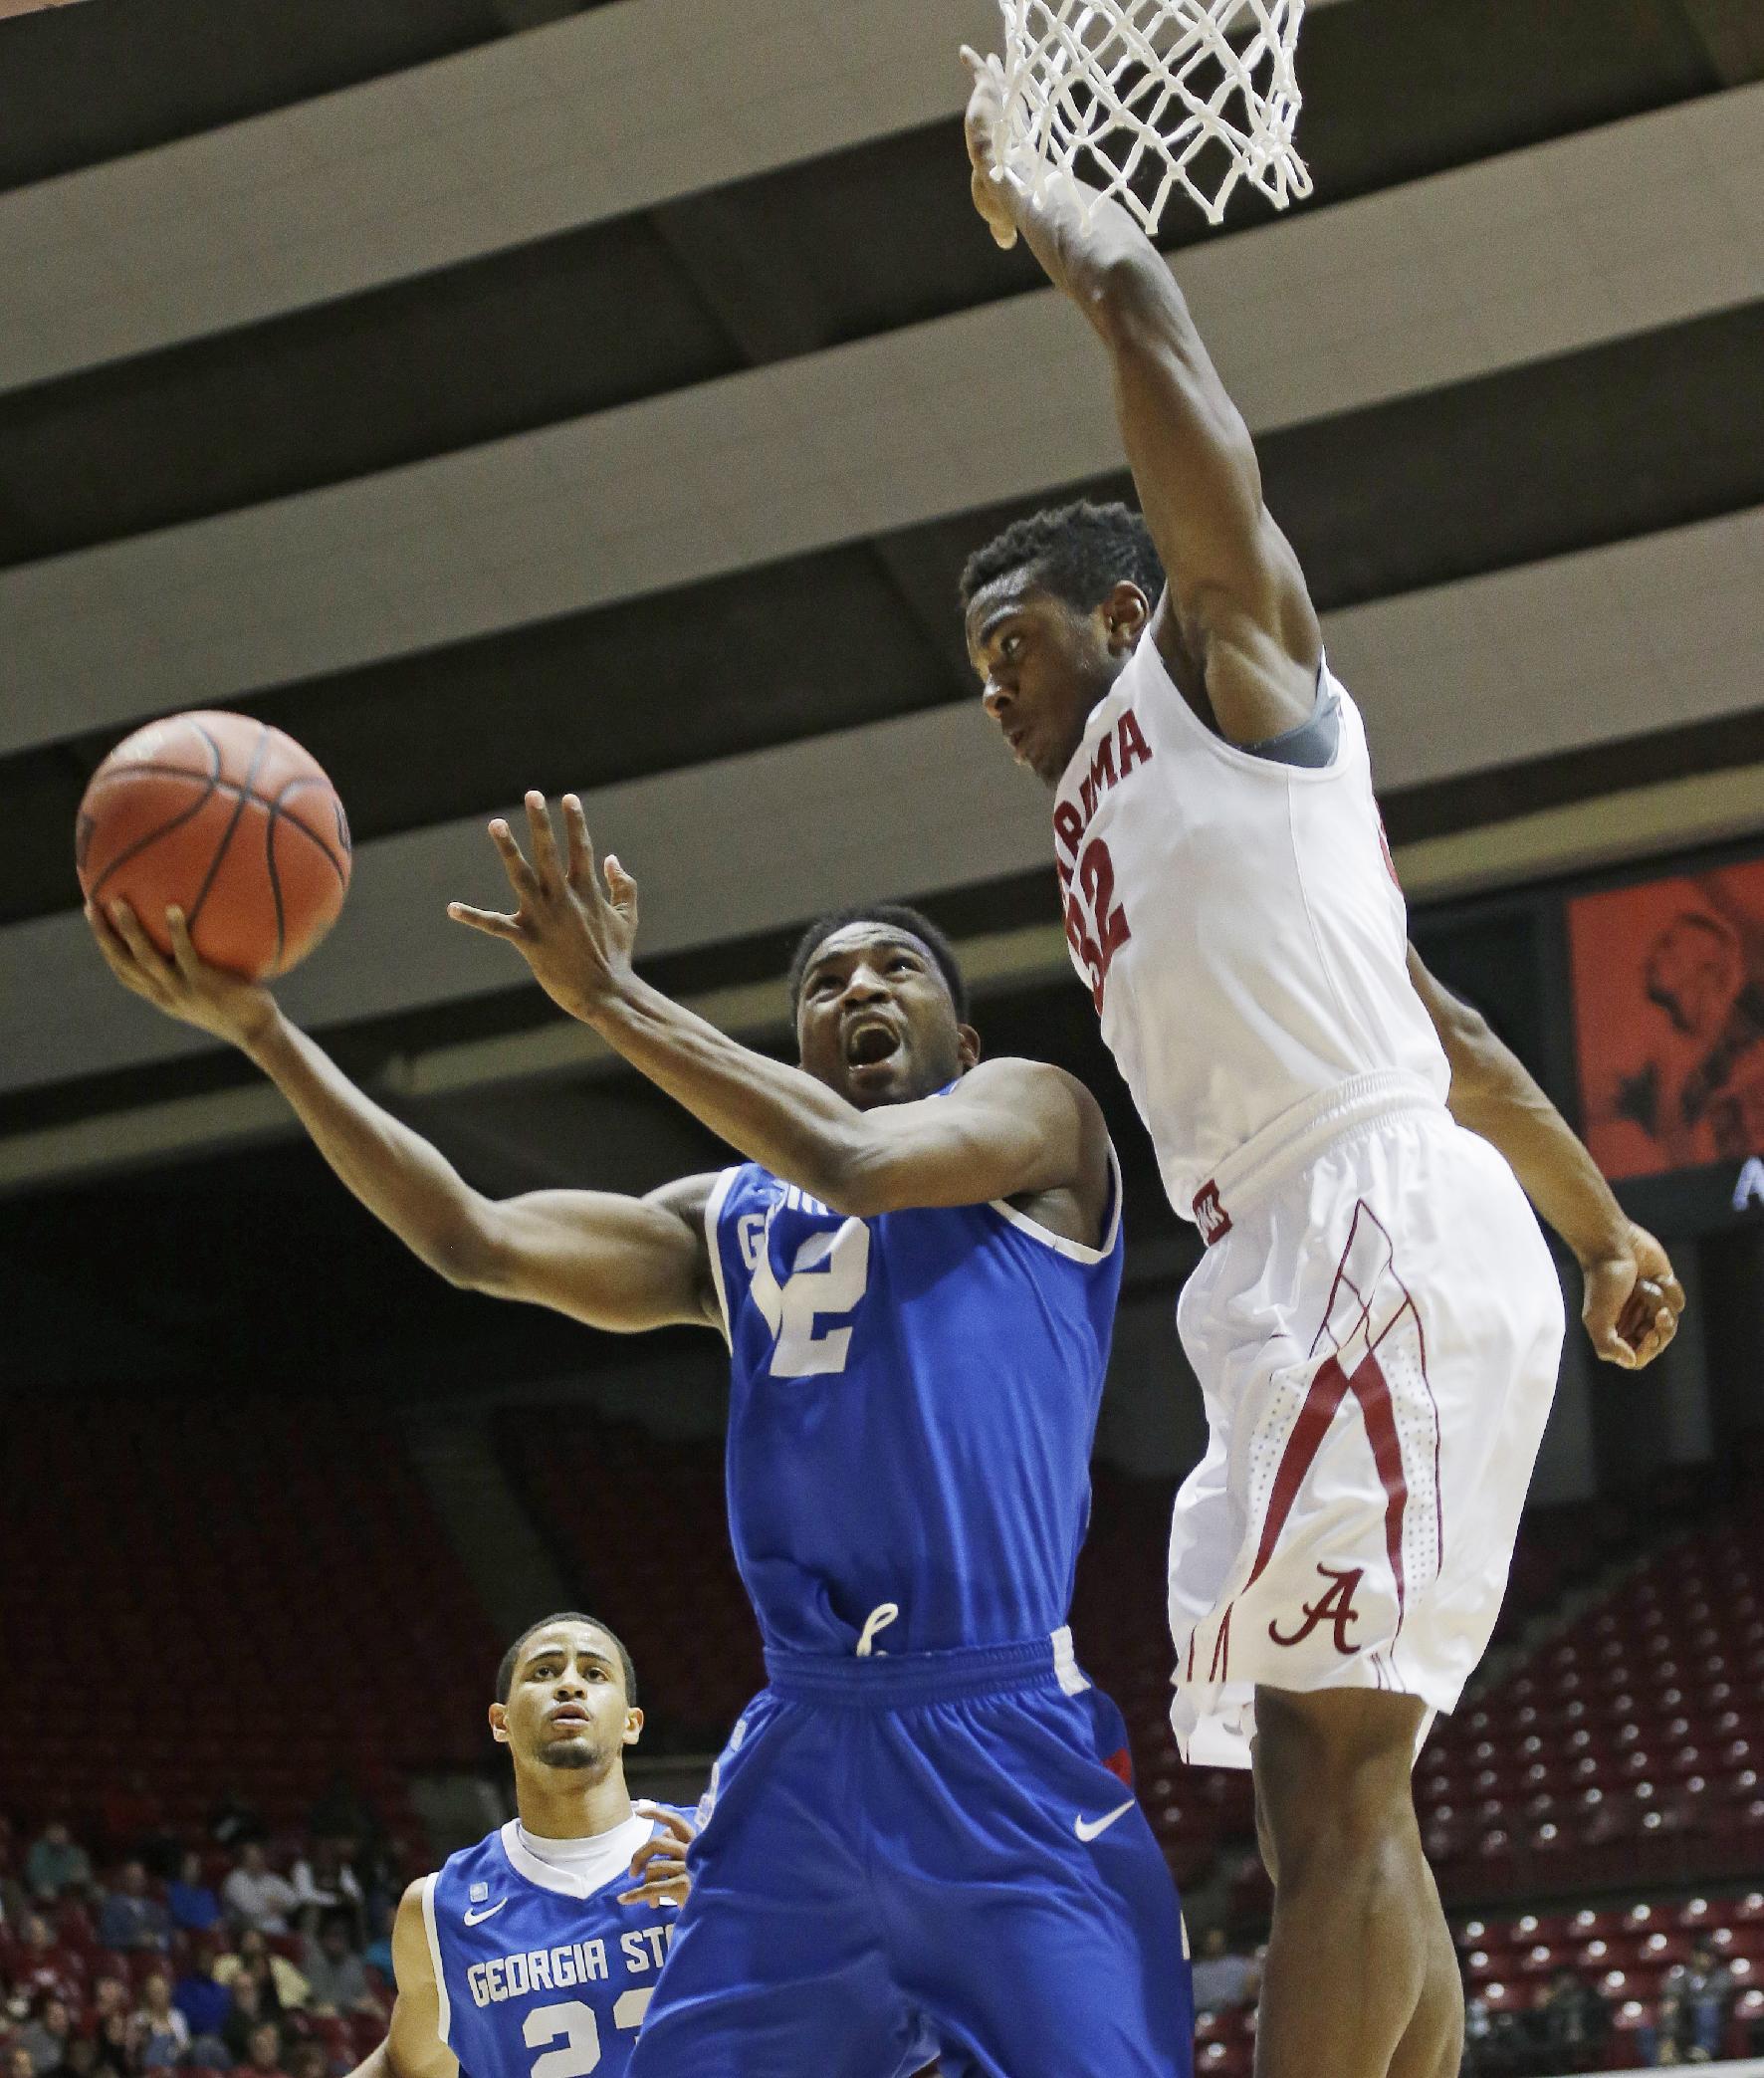 Alabama defeats Georgia State 75-58